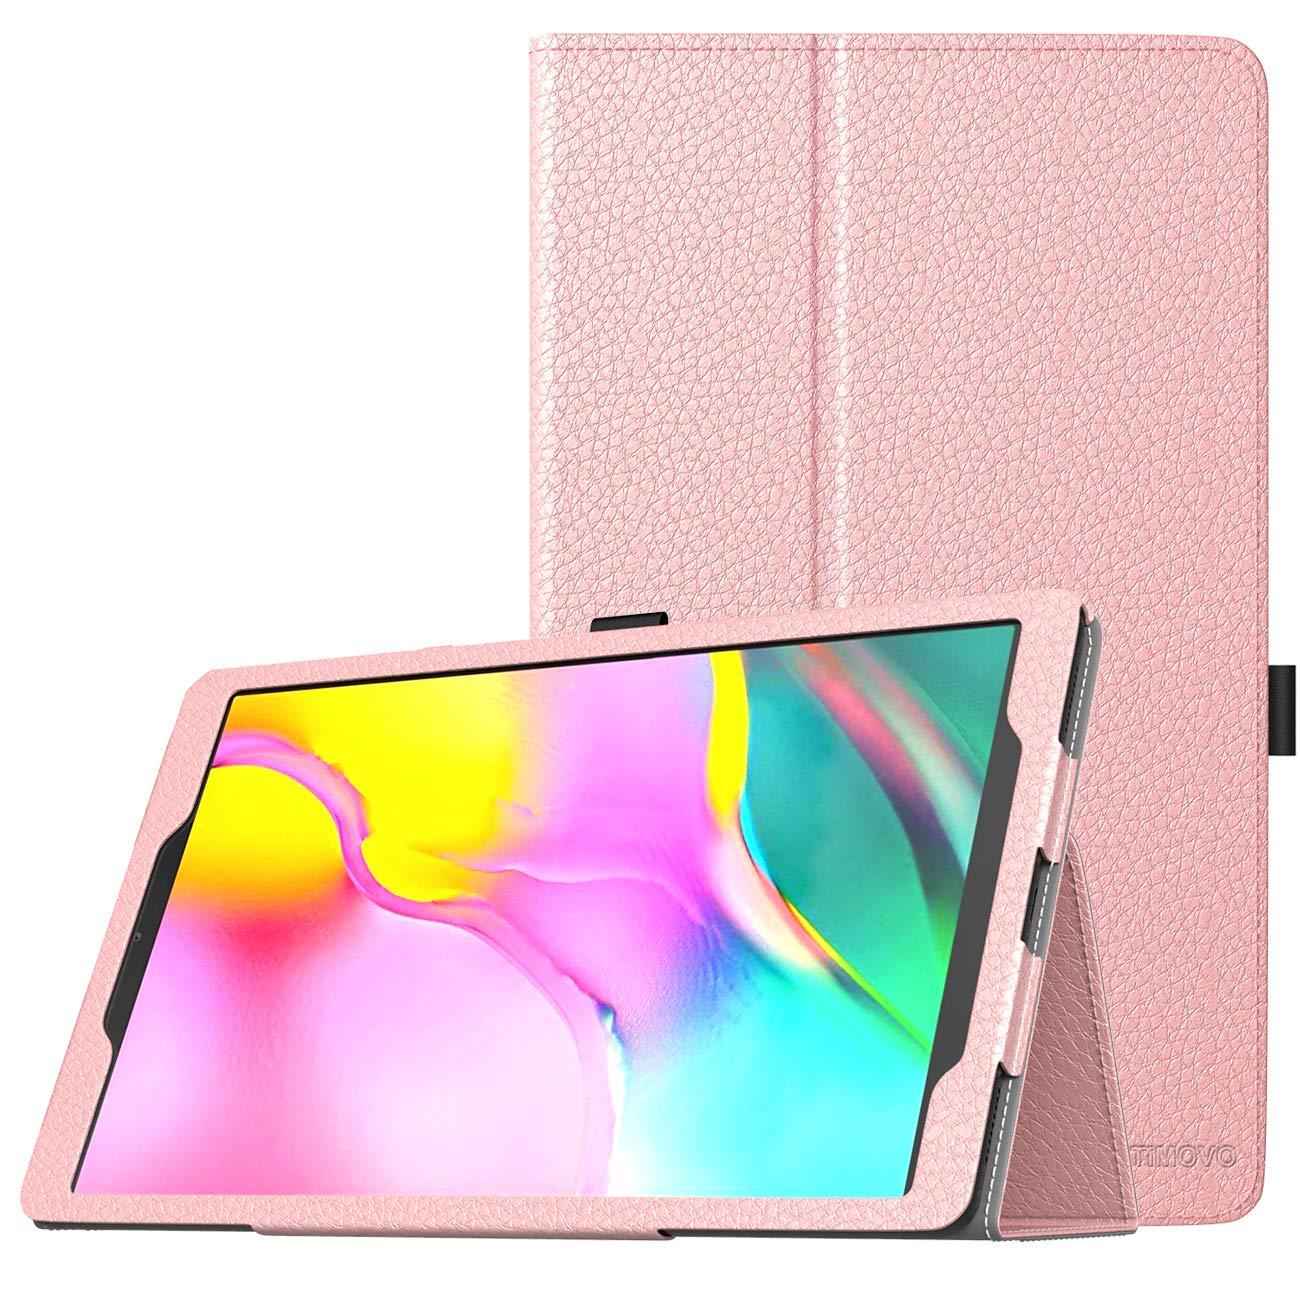 Funda Samsung Galaxy Tab A 10.1 SM-T510 (2019) TIMOVO [7S1R46ZX]